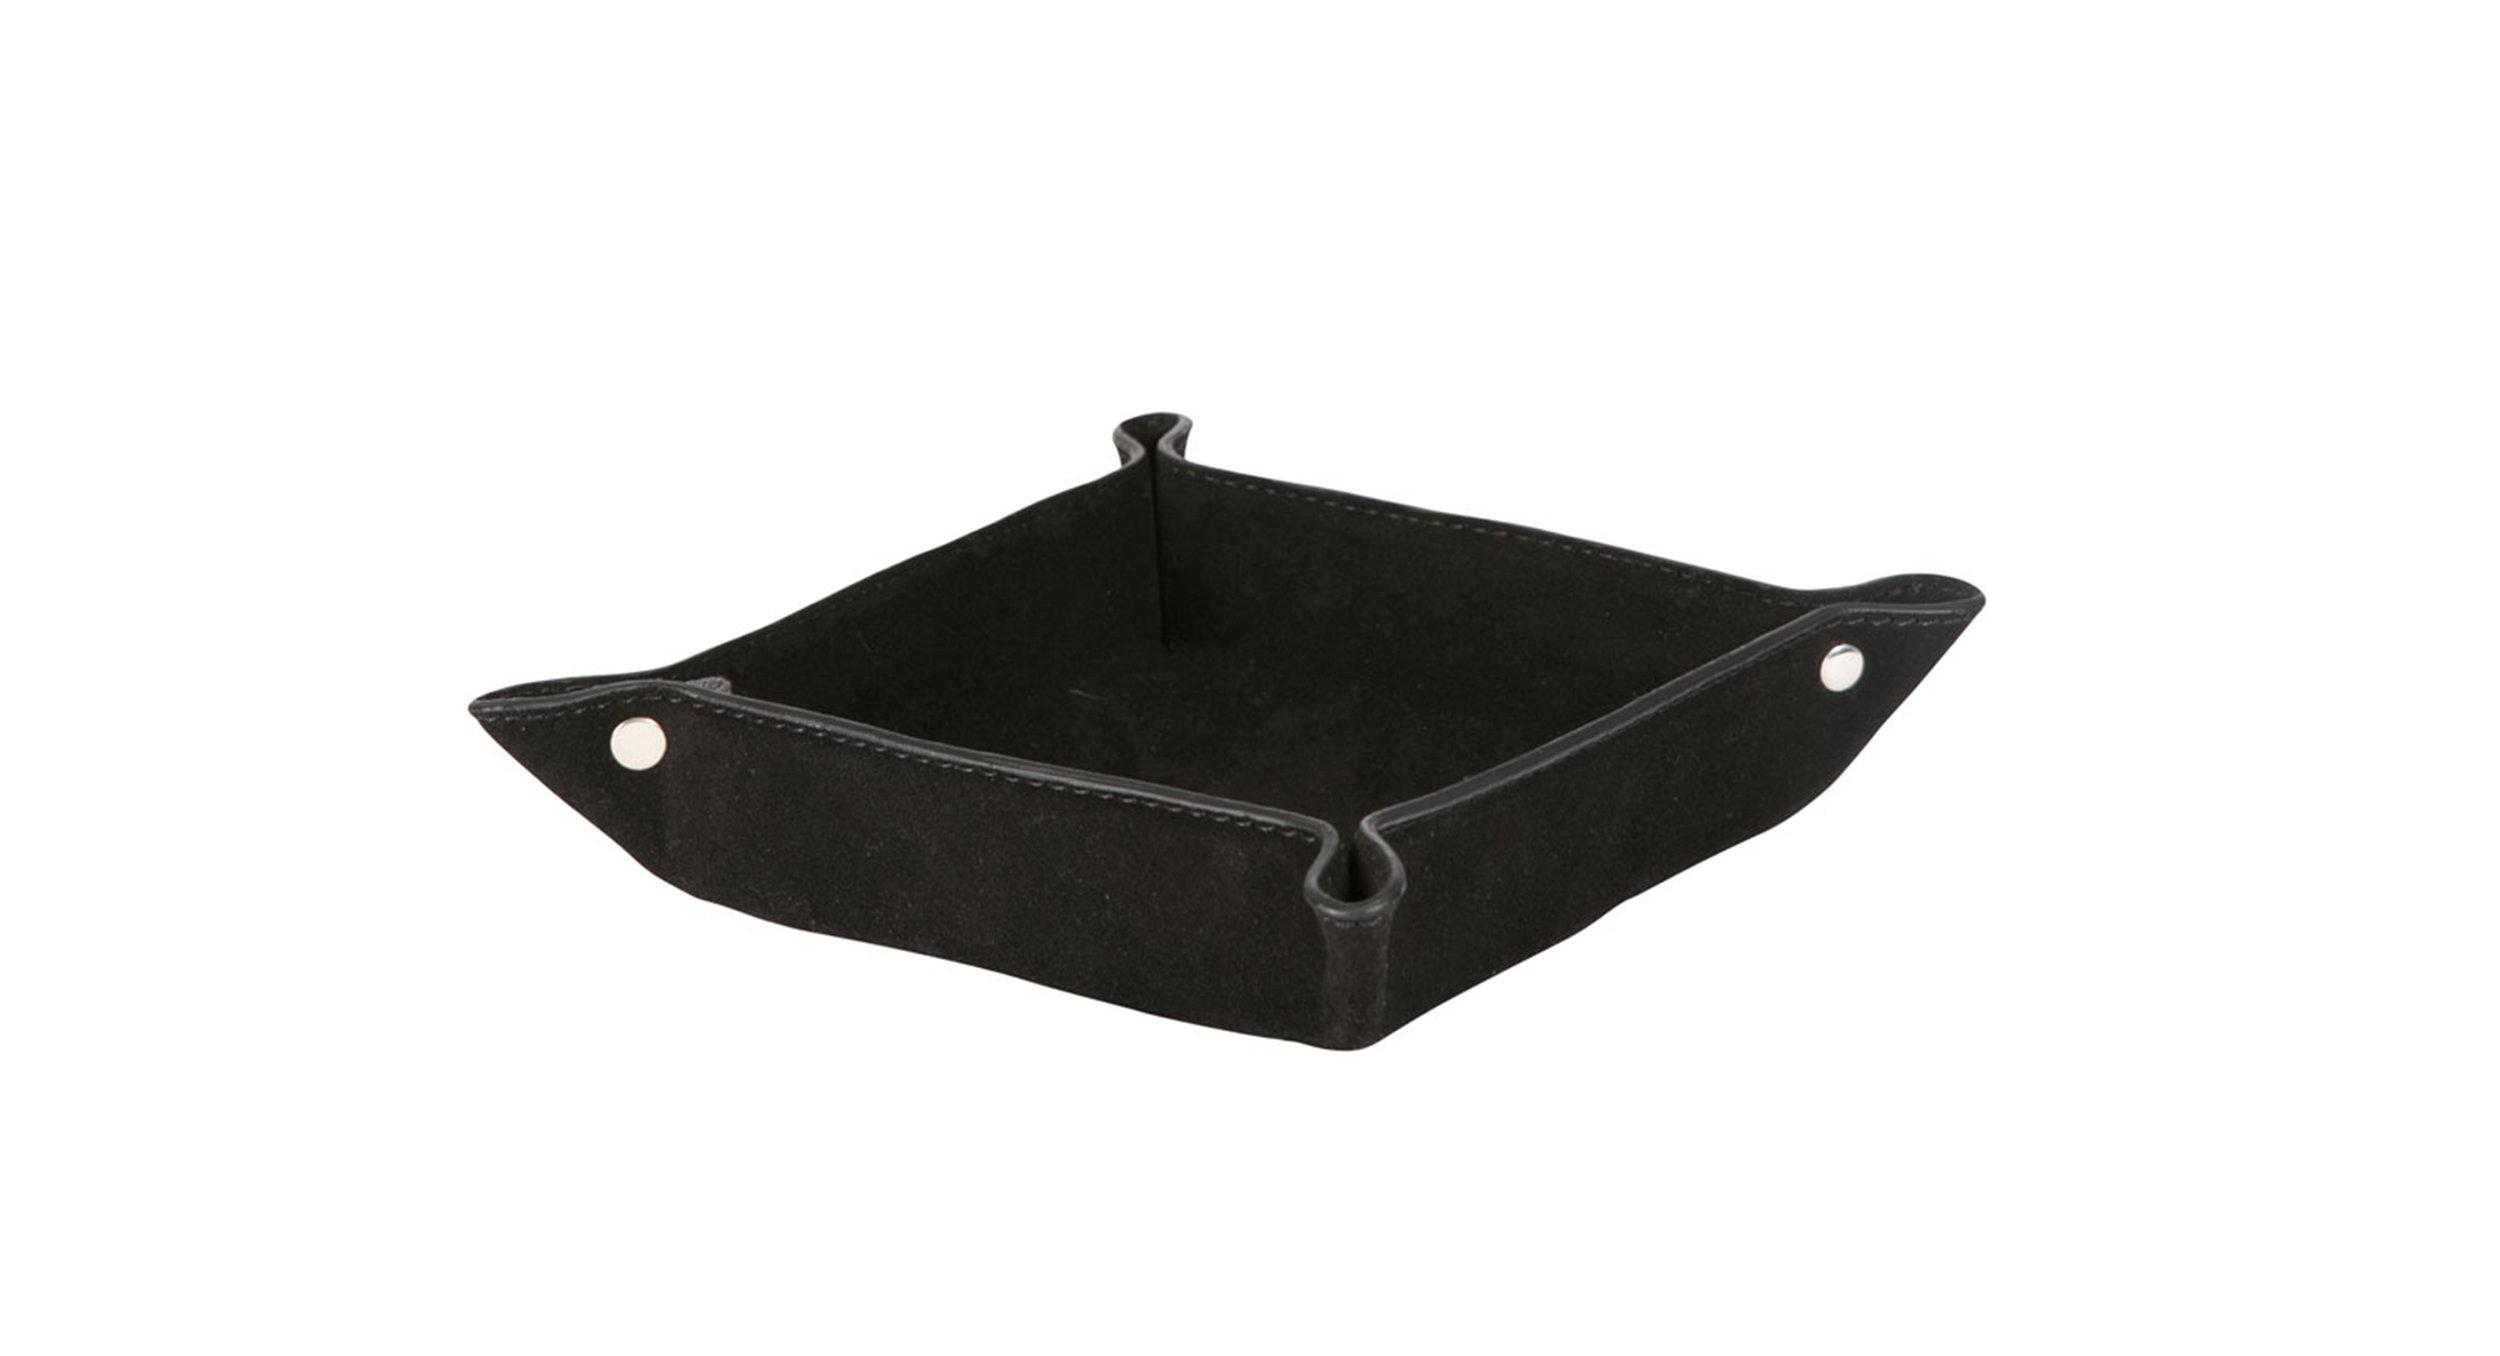 Skeen black suede 14x14x5cm